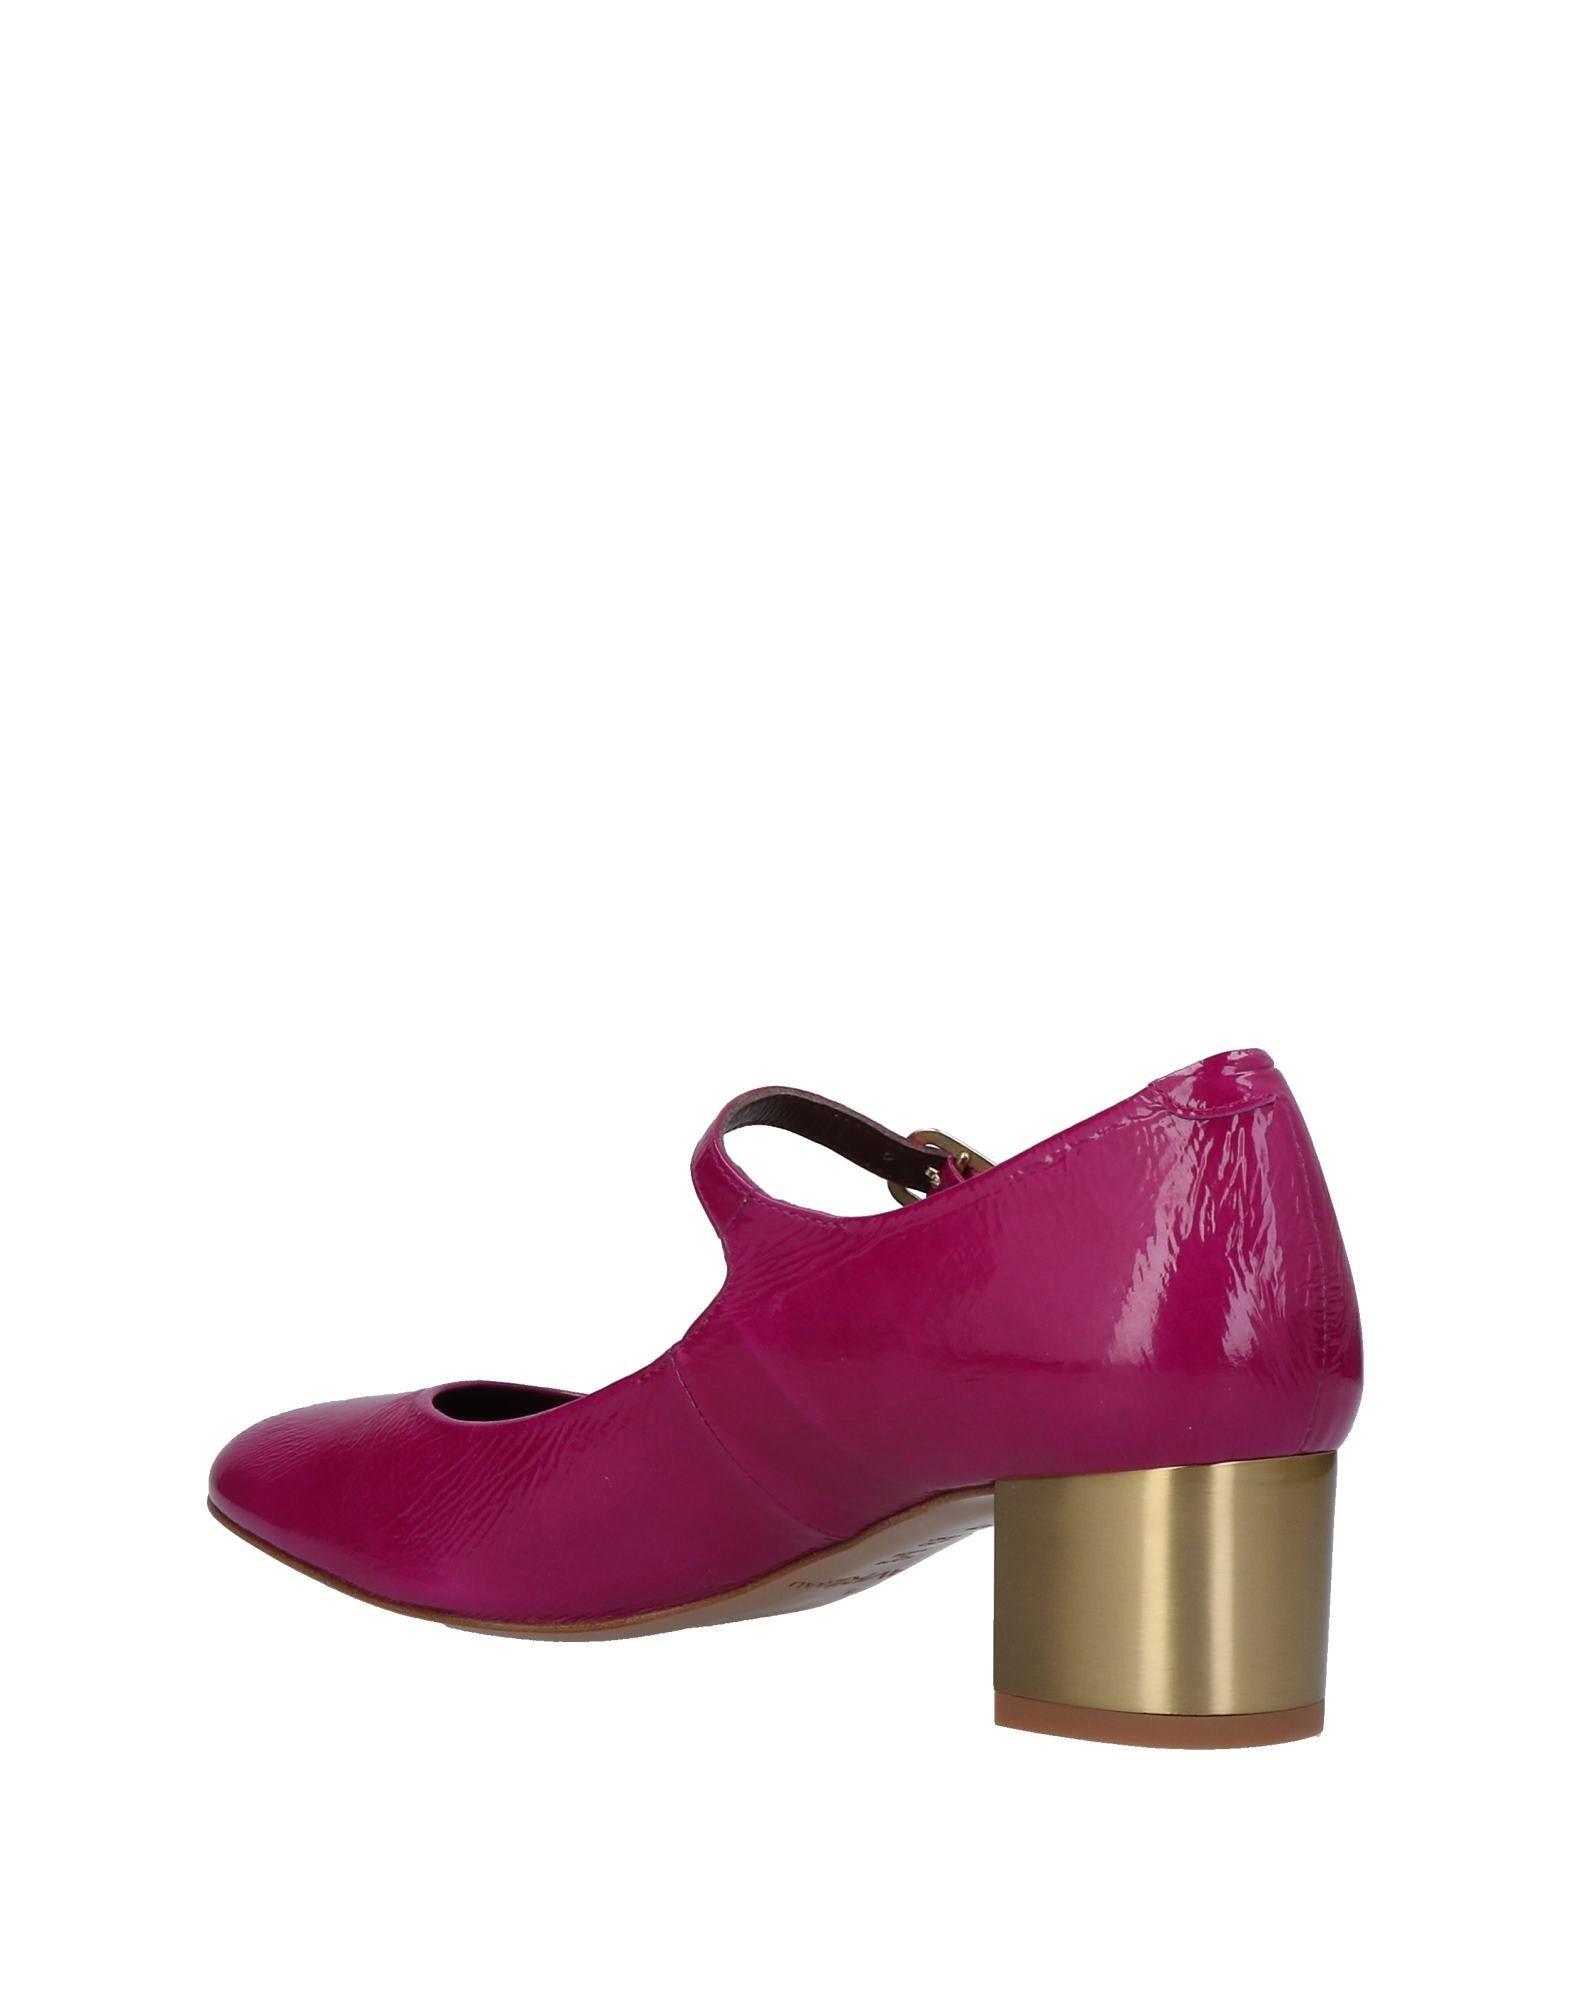 Stilvolle billige Schuhe Avril 11430415EH Gau Pumps Damen  11430415EH Avril c761da